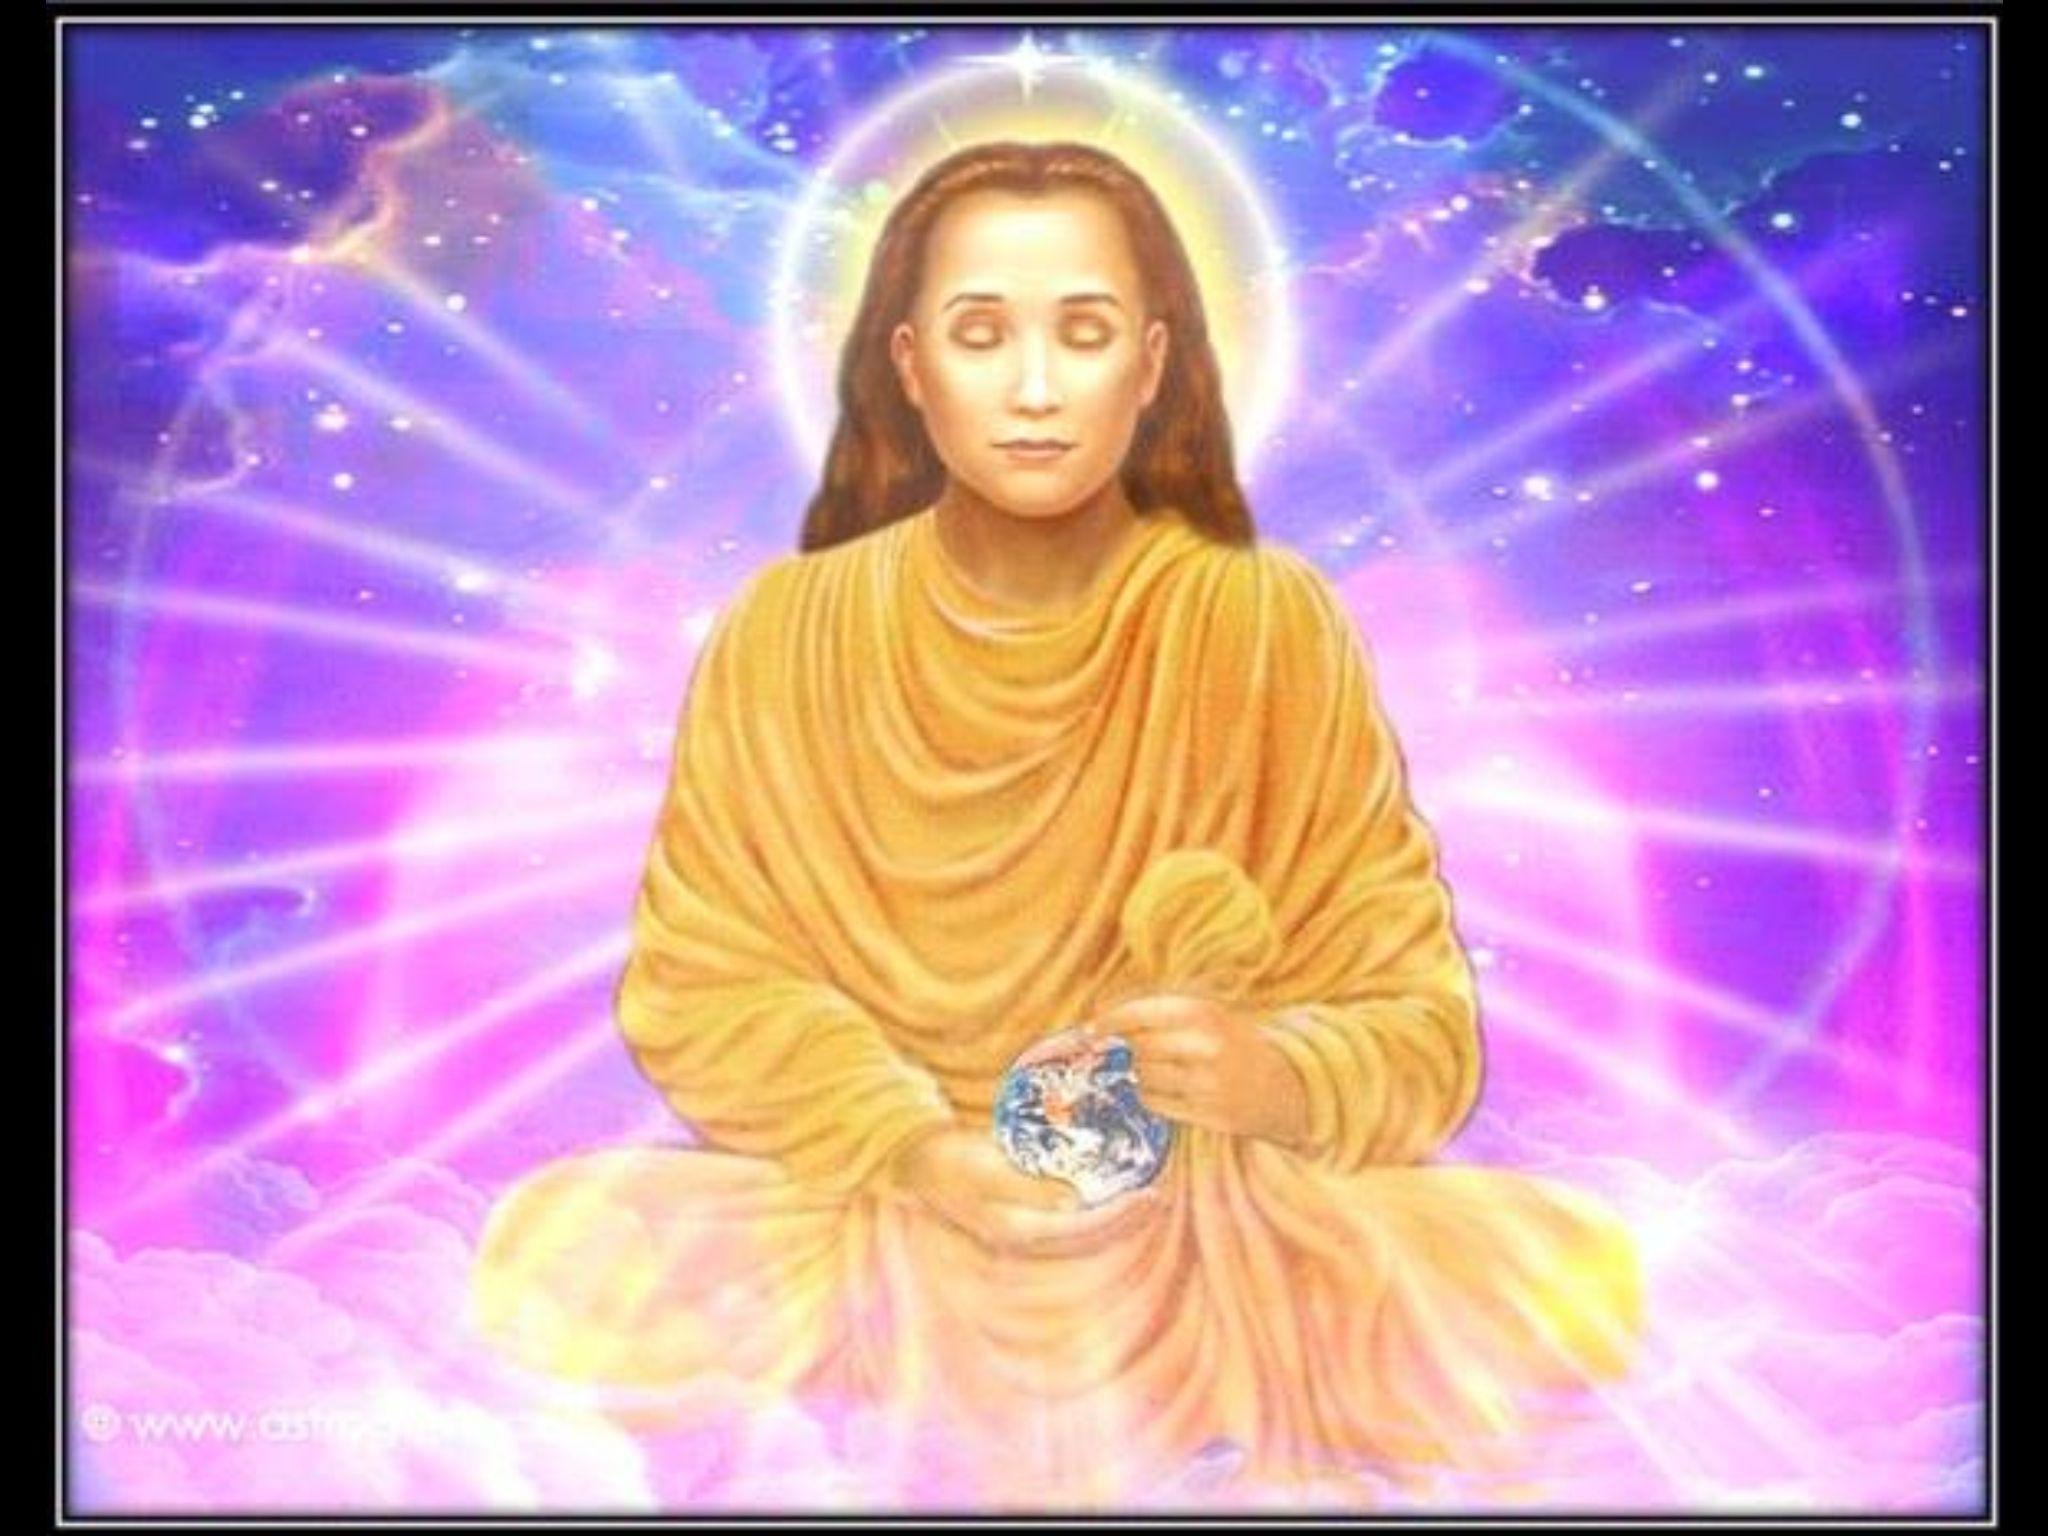 Mahavatar Babaji | Babaji, Mahavatar babaji, Love problems